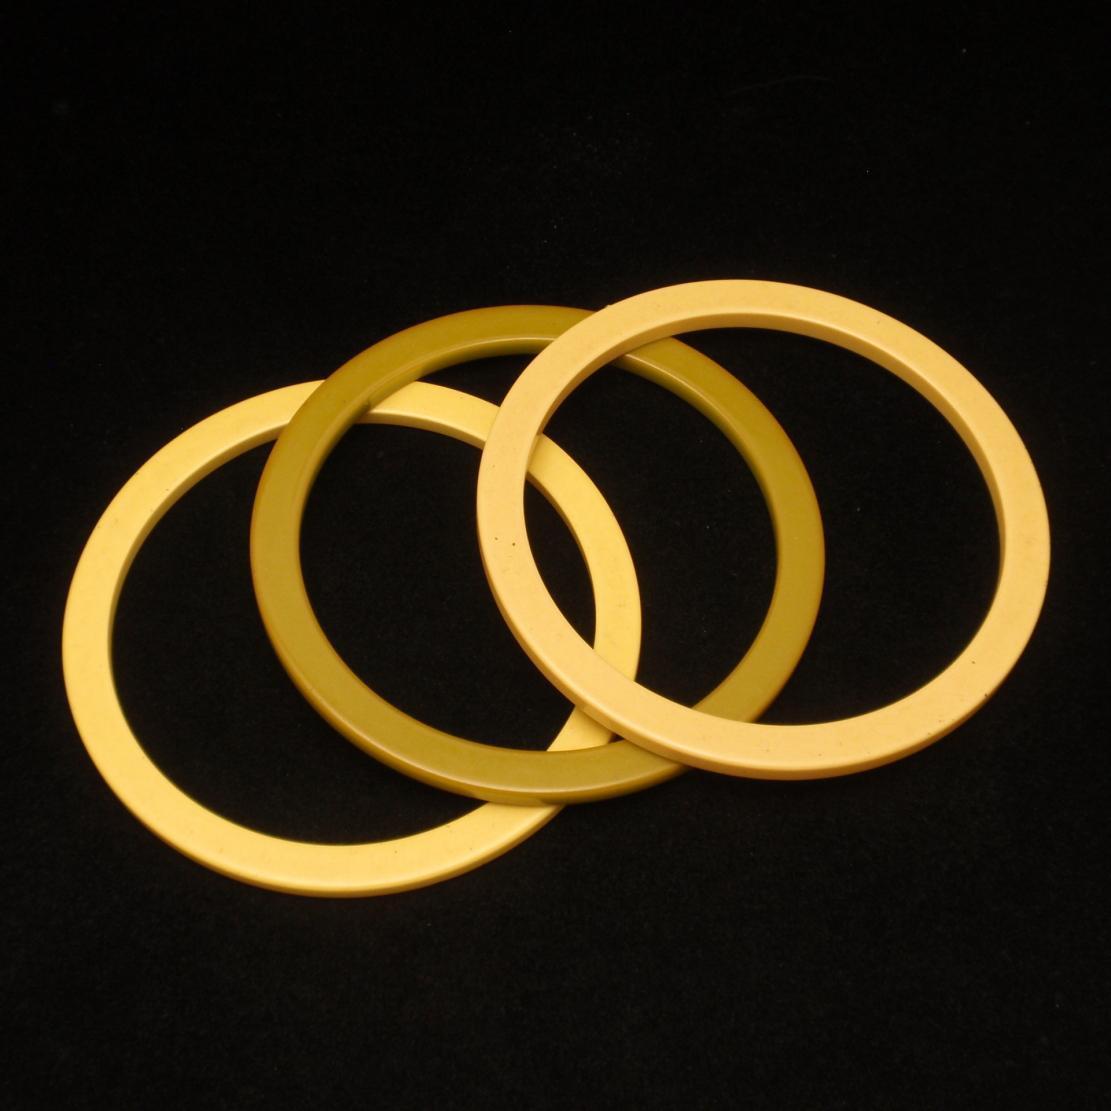 Lot of 3 Spacers or Bangle Bracelets